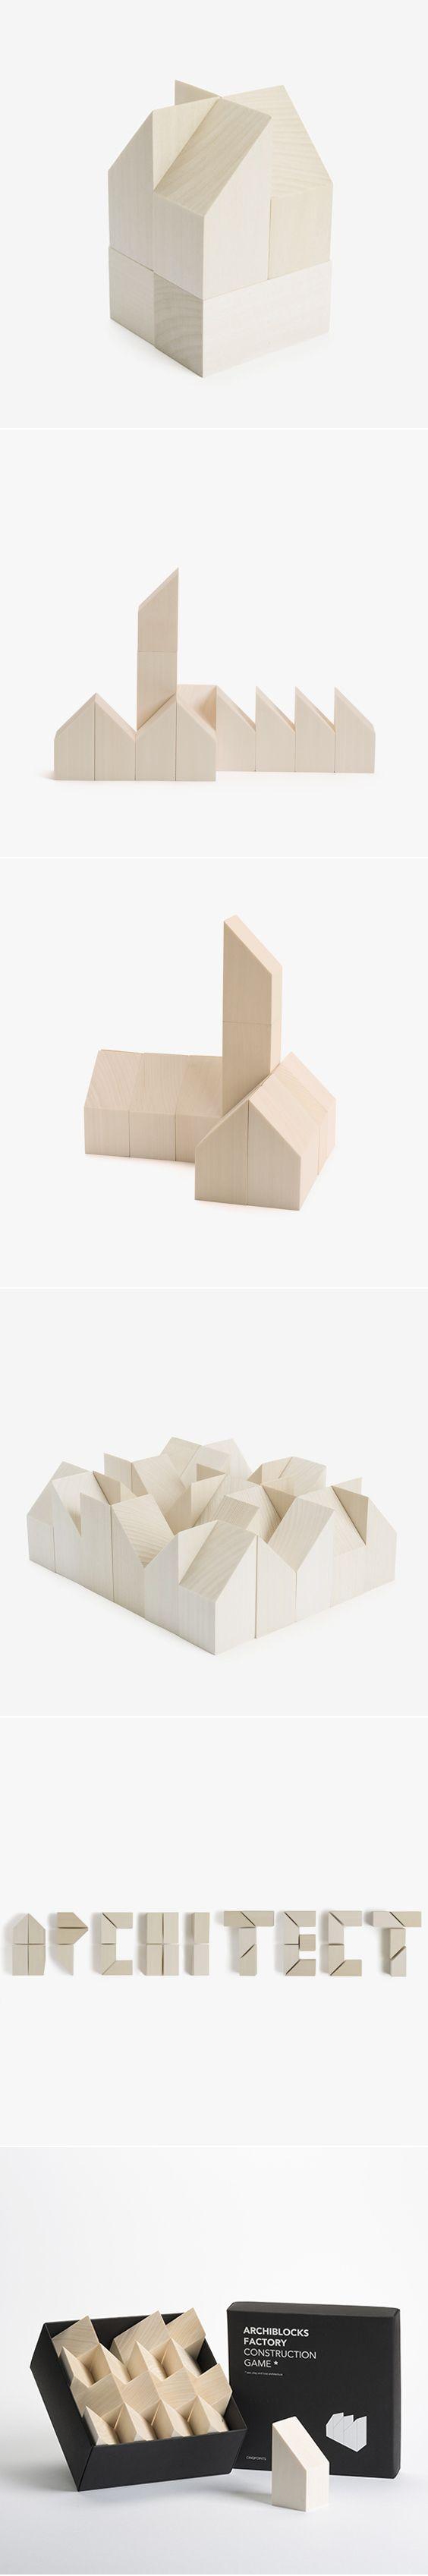 Archiblocks Factory: Bauhaus inspired building blocks - Cinqpoints